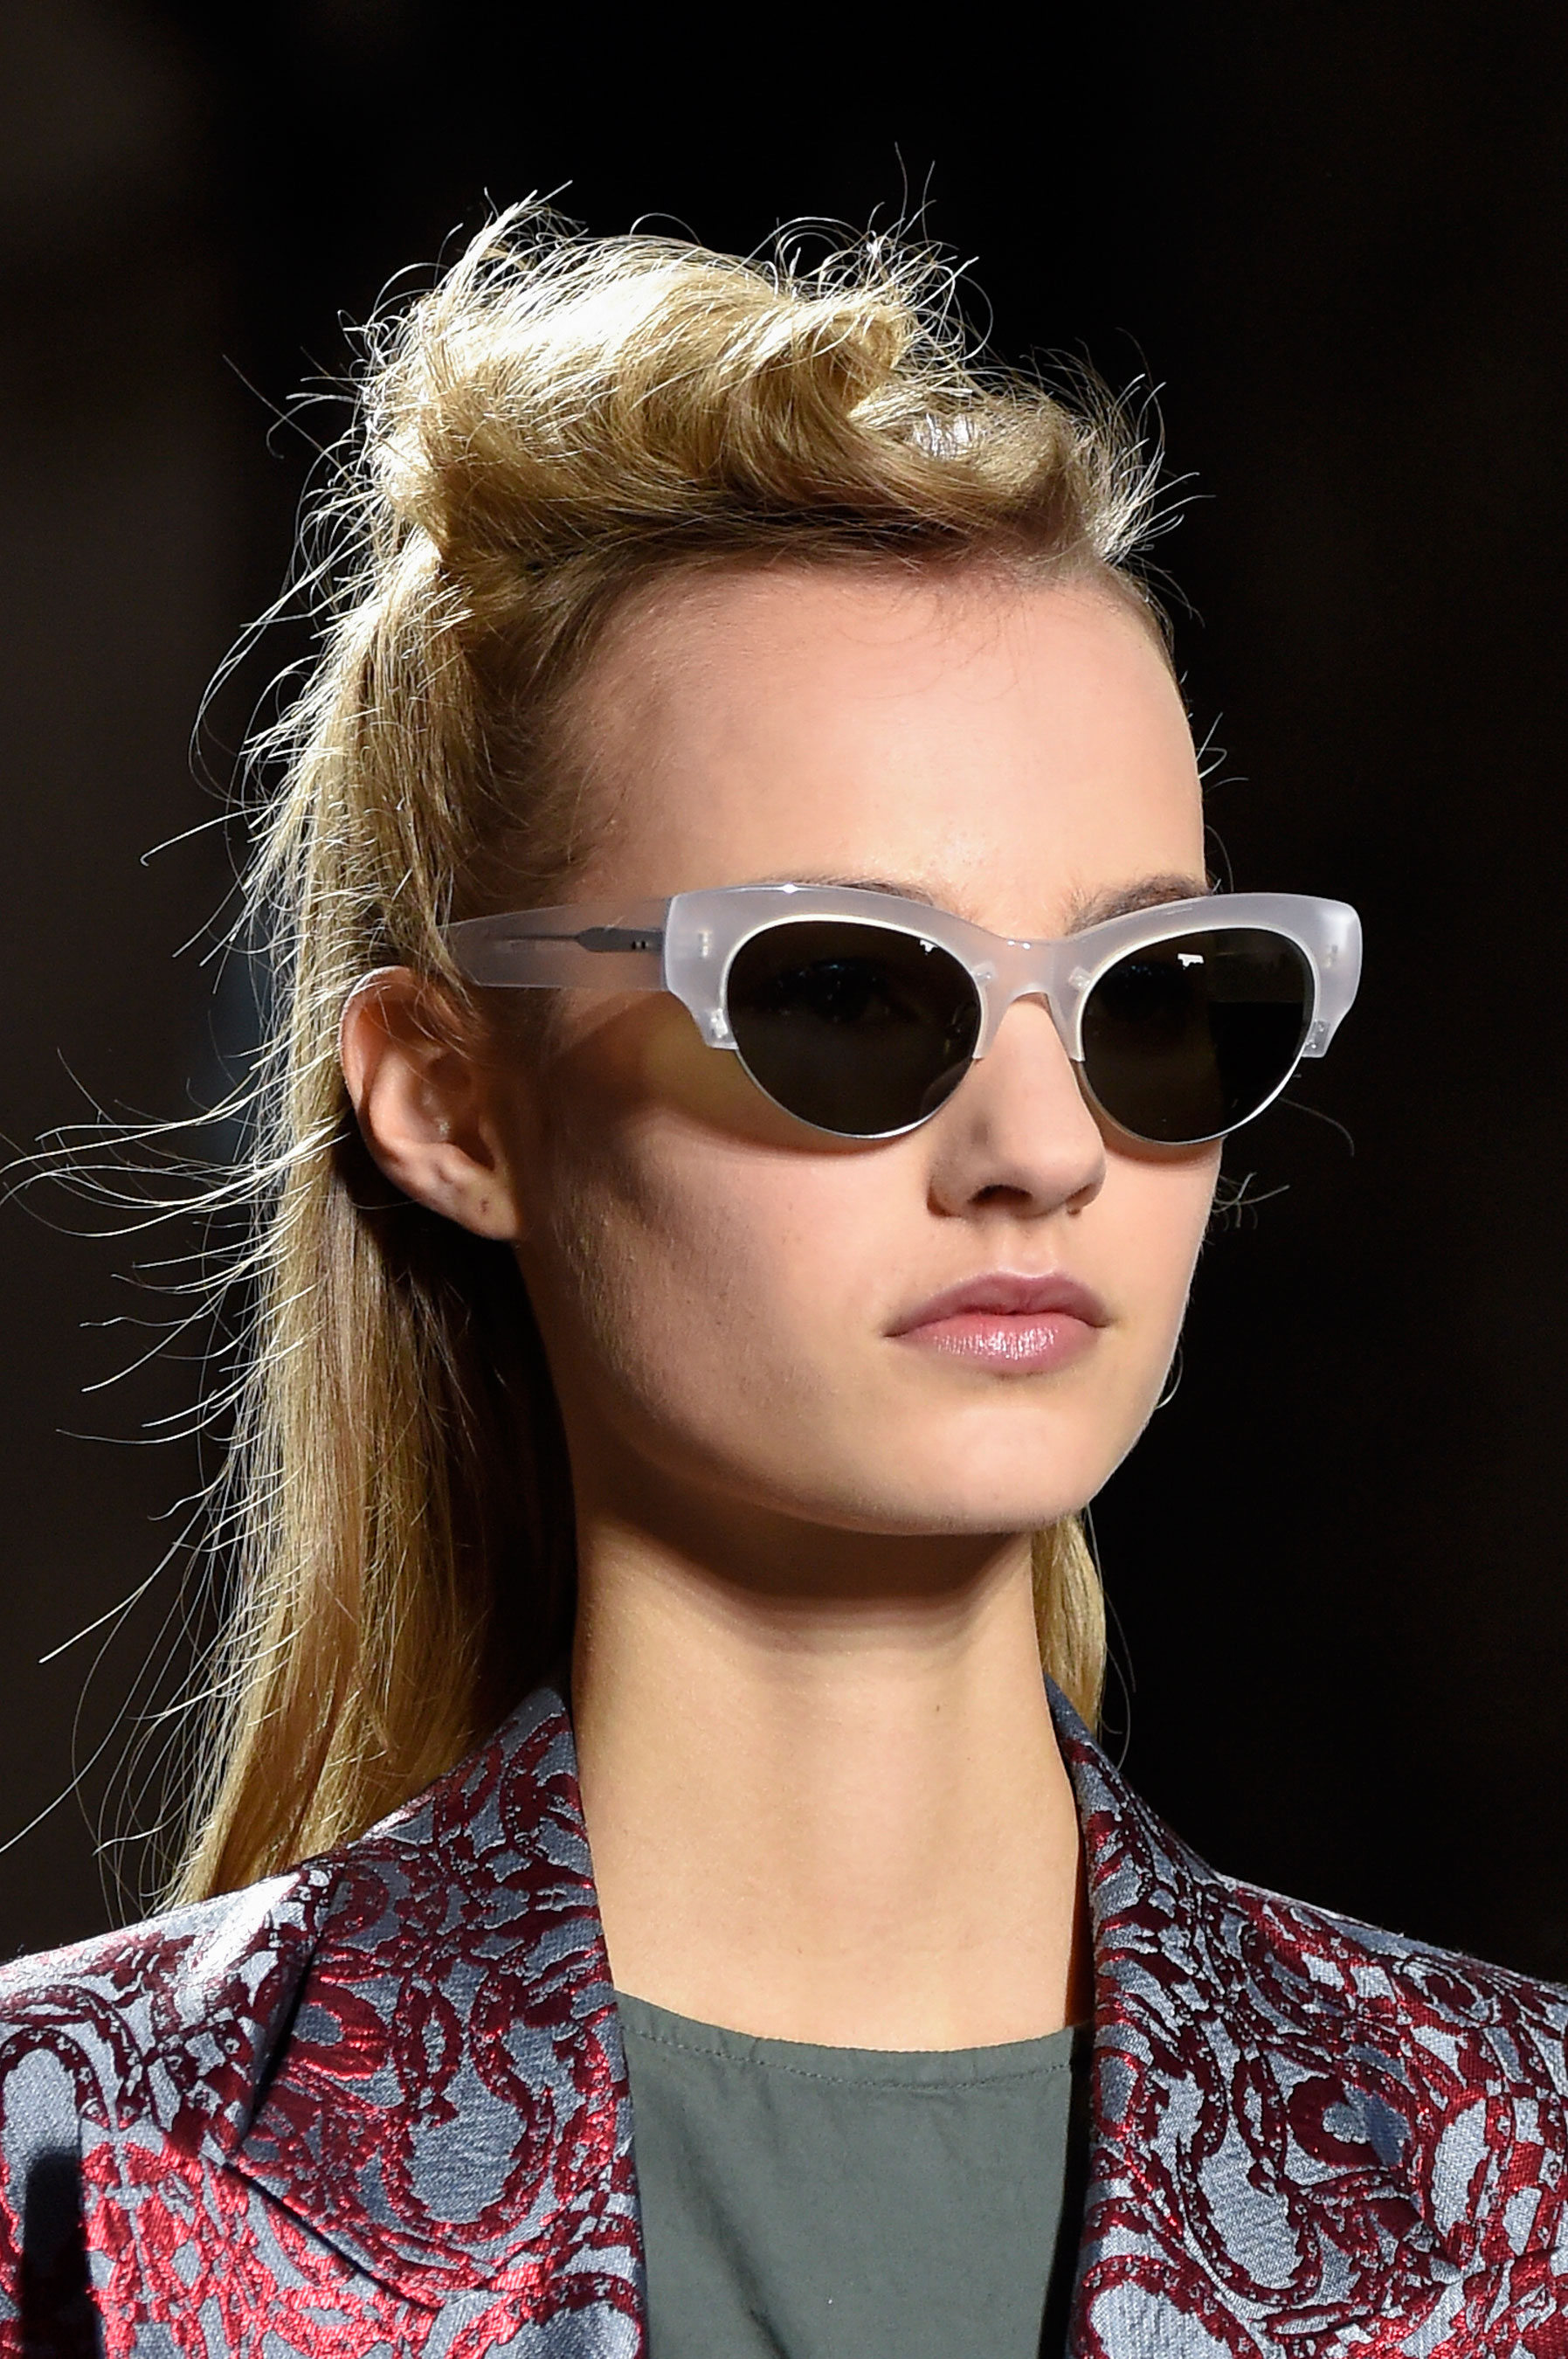 Dries-van-Noten-spring-2016-runway-beauty-fashion-show-the-impression-20